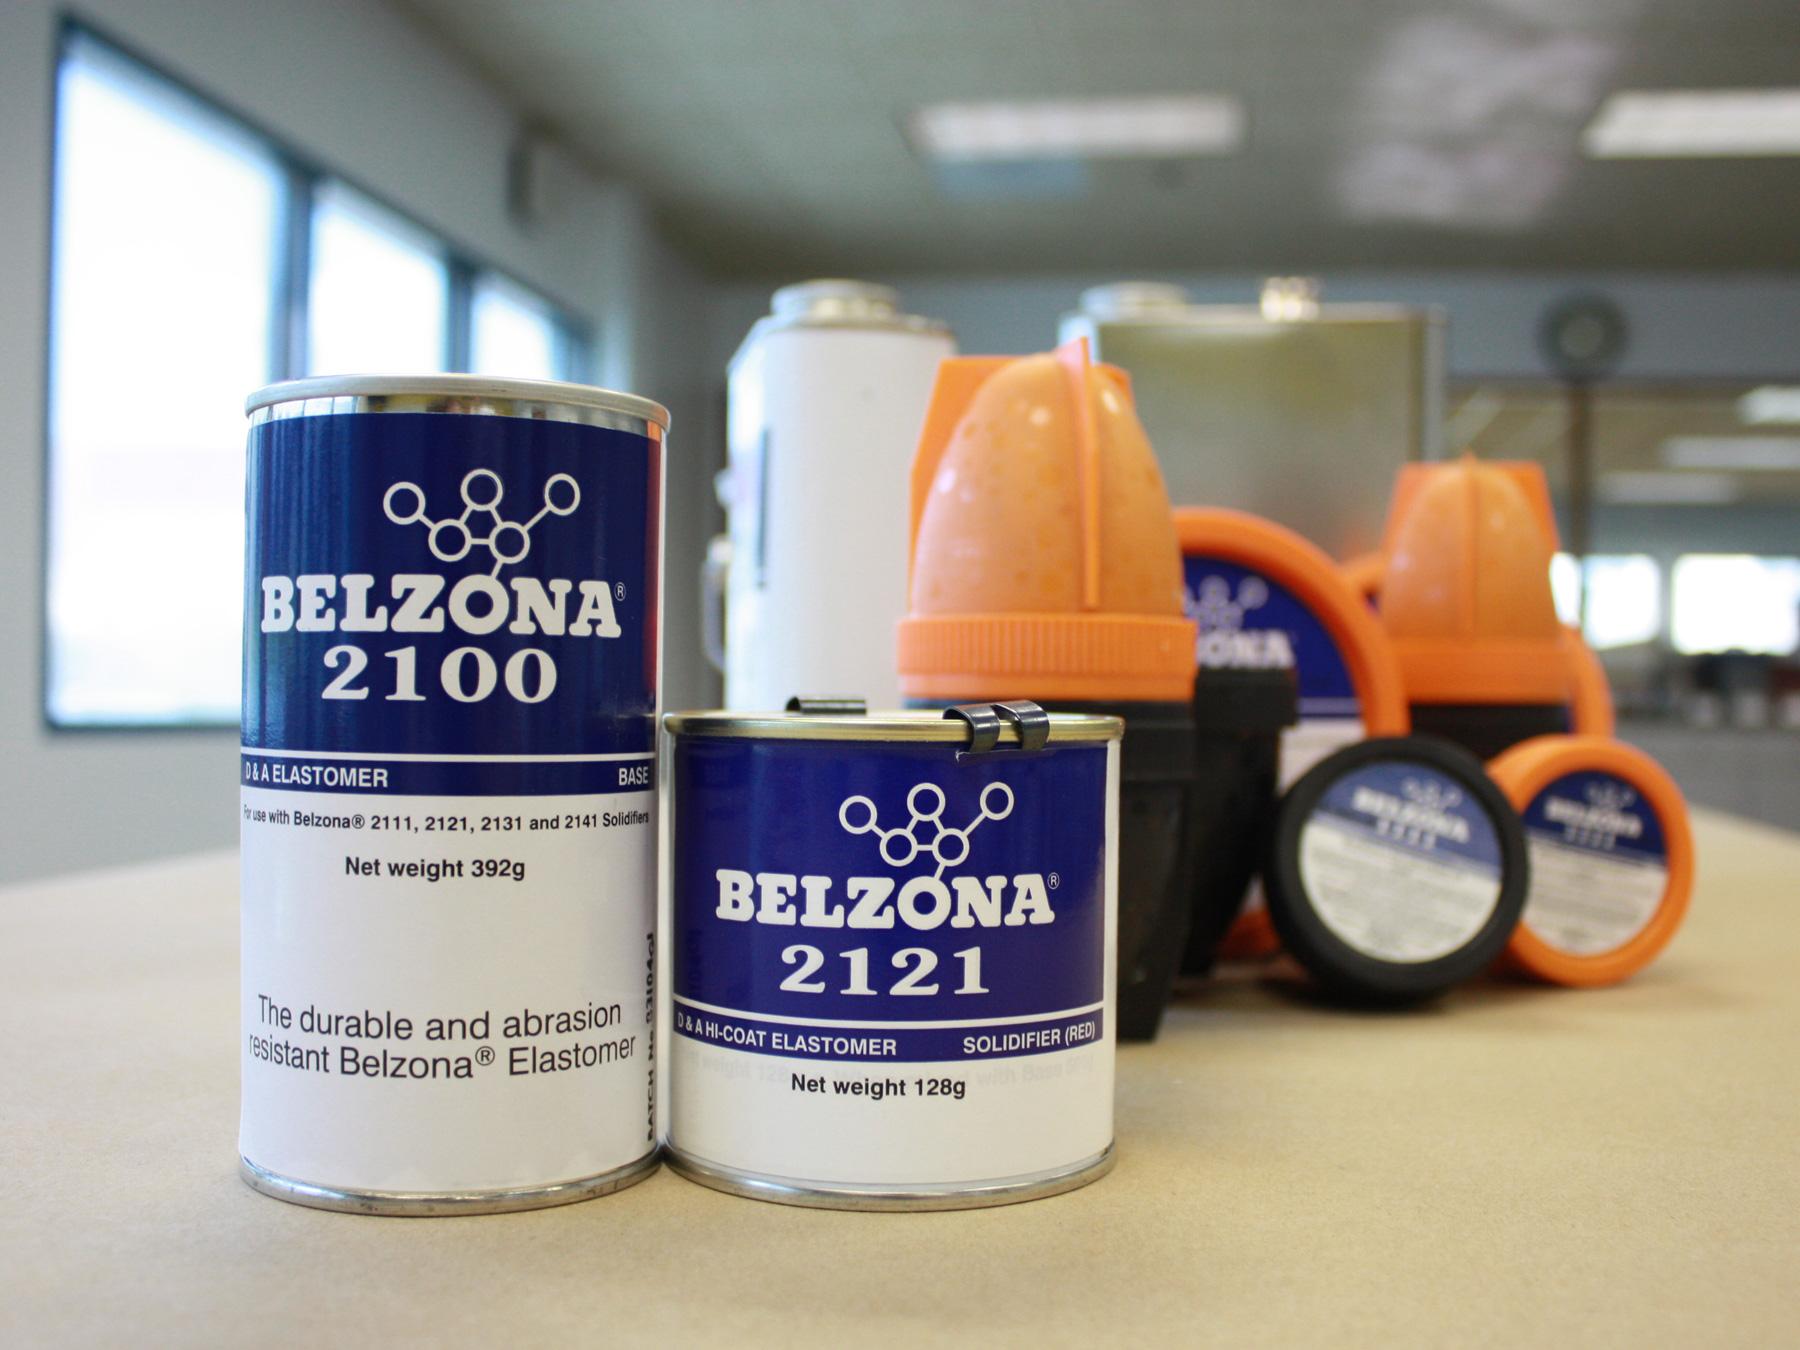 Belzona 2121 (D&A Hi-Coat Elastomer) flaksibilan poliuretanski elastomer otporan na abraziju za metane površine i gumene komponente